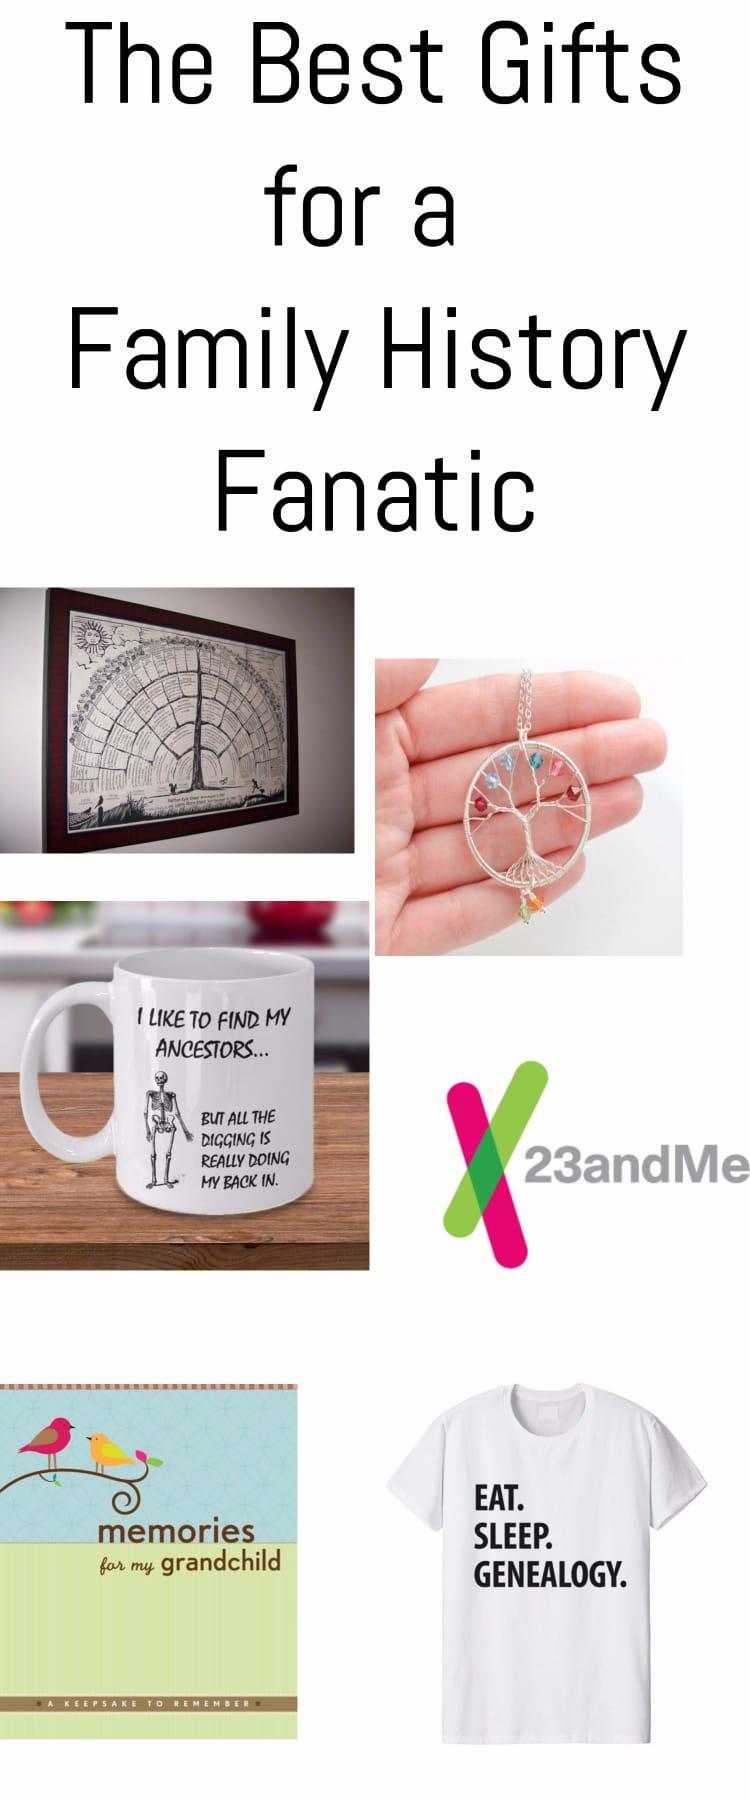 Family history gifts / family history gift ideas / genealogy / church / ancestry